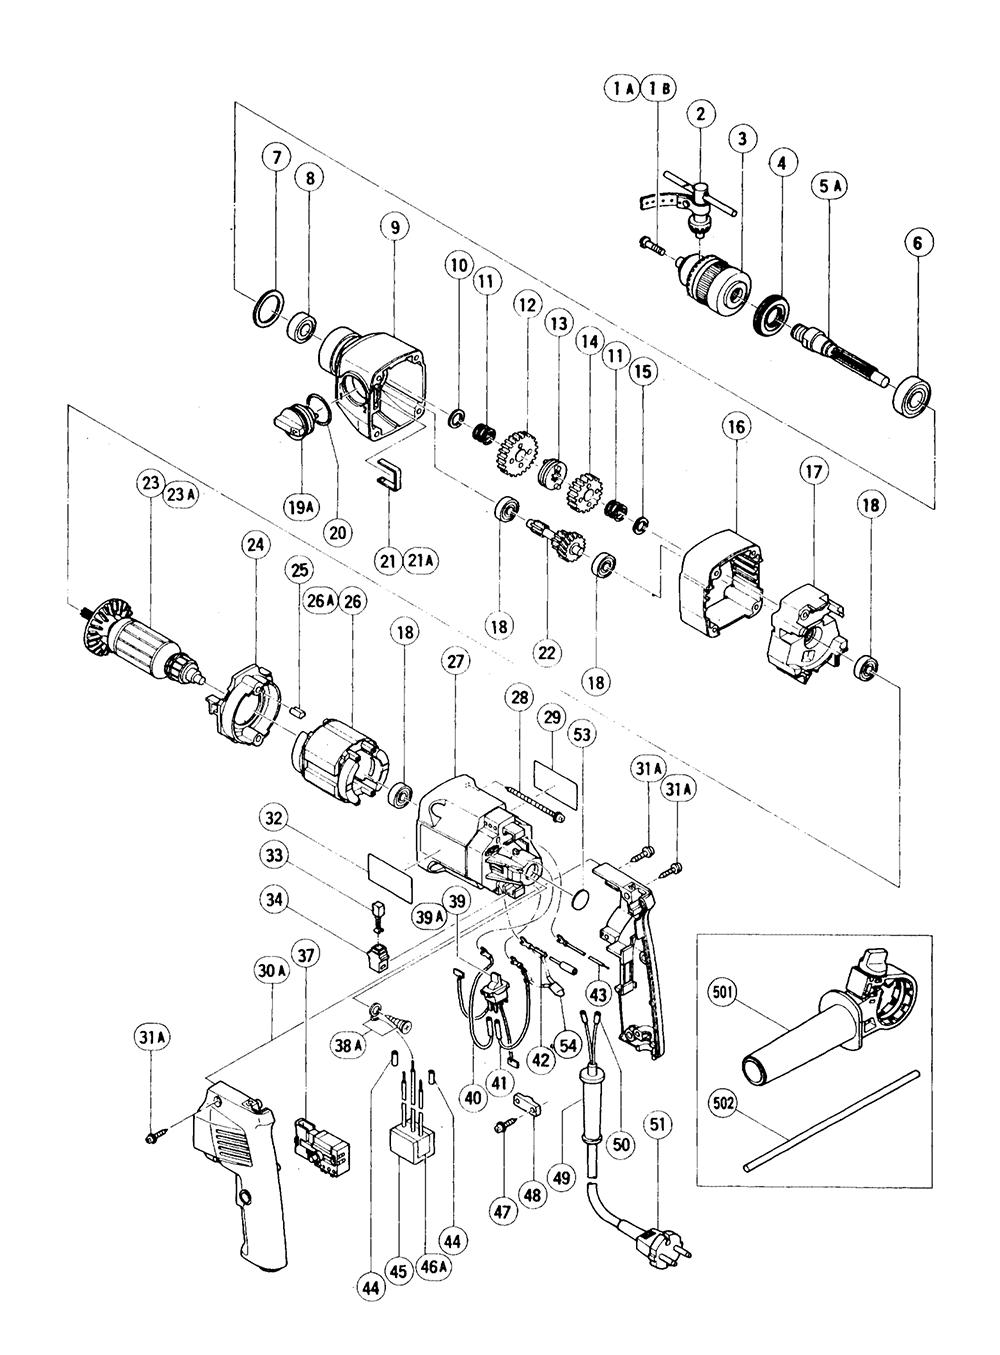 1995 international 4900 transmission wiring diagram international 4300 fuse box diagram